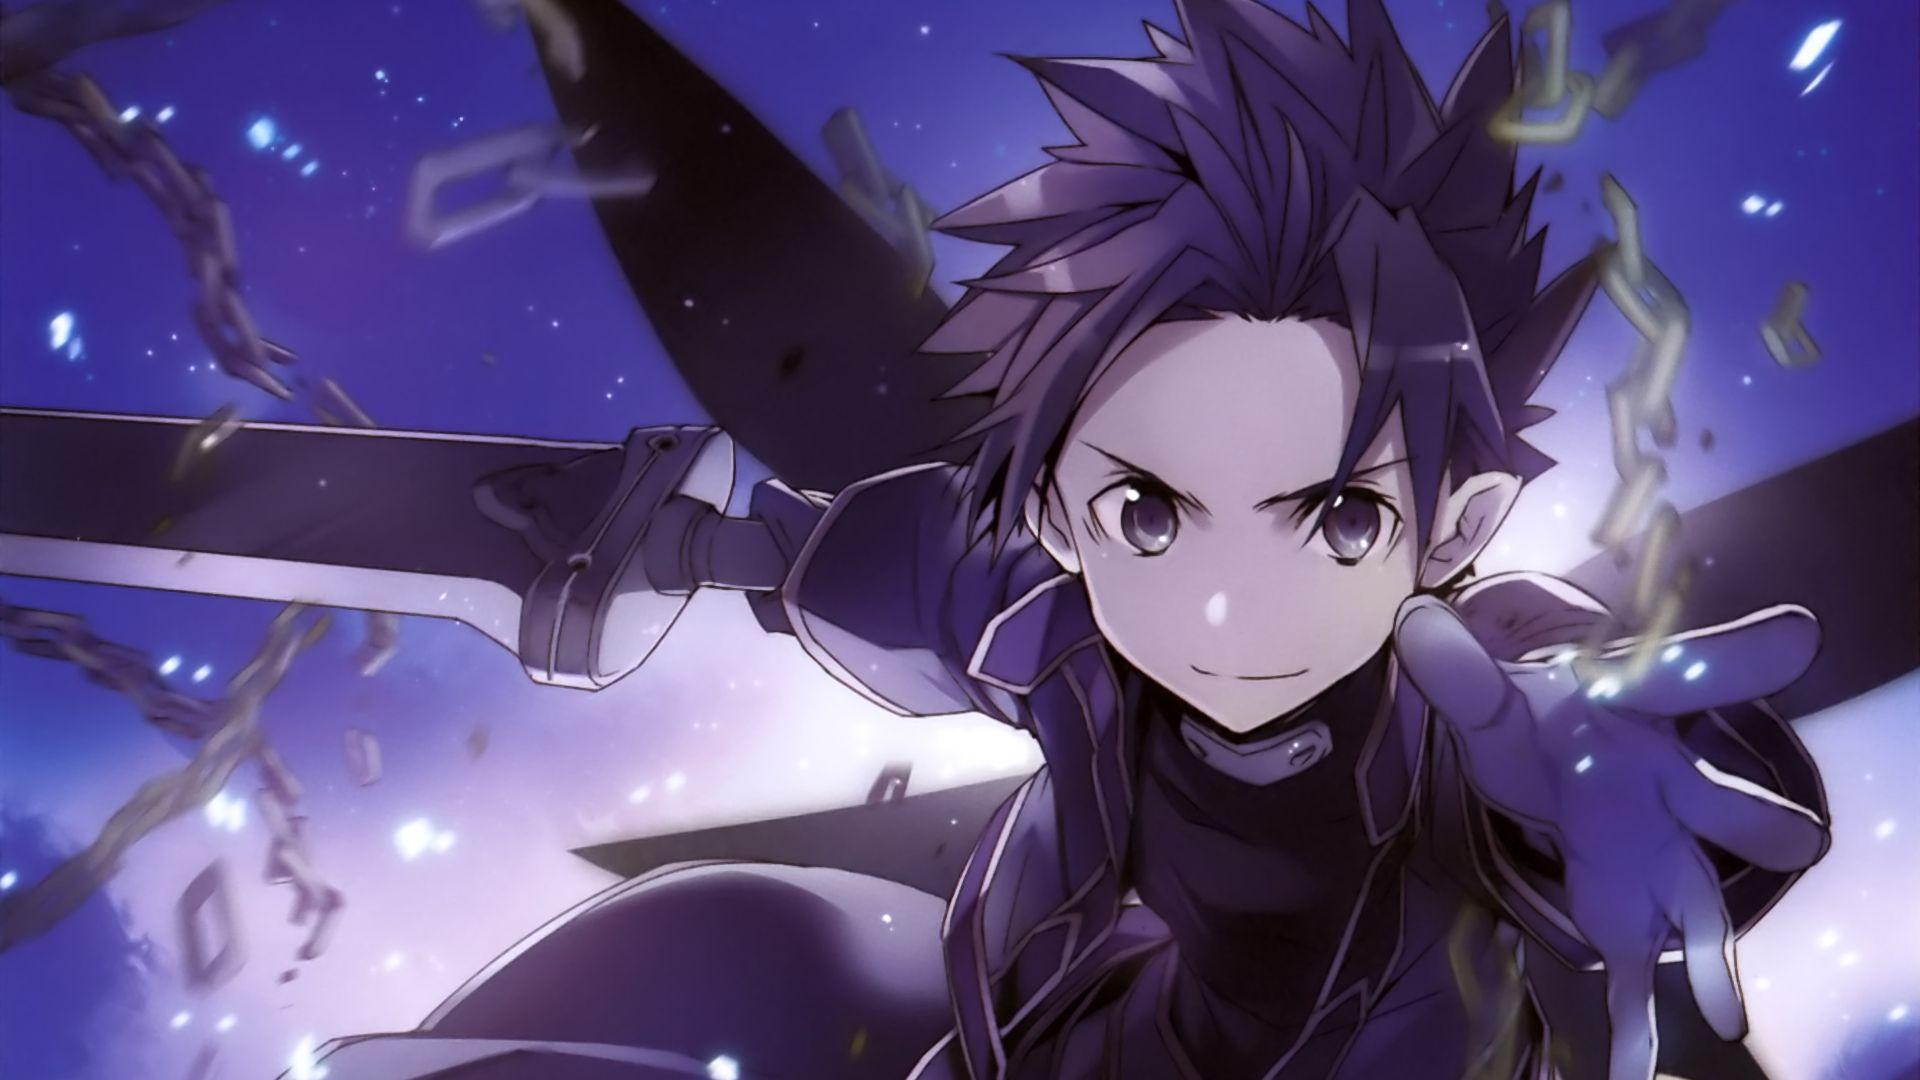 3d Wallpapers Hd Full Hd 1080p 1920x1080 Desktop Wallpaper Kirito Sword Art Online Anime Sao Hd